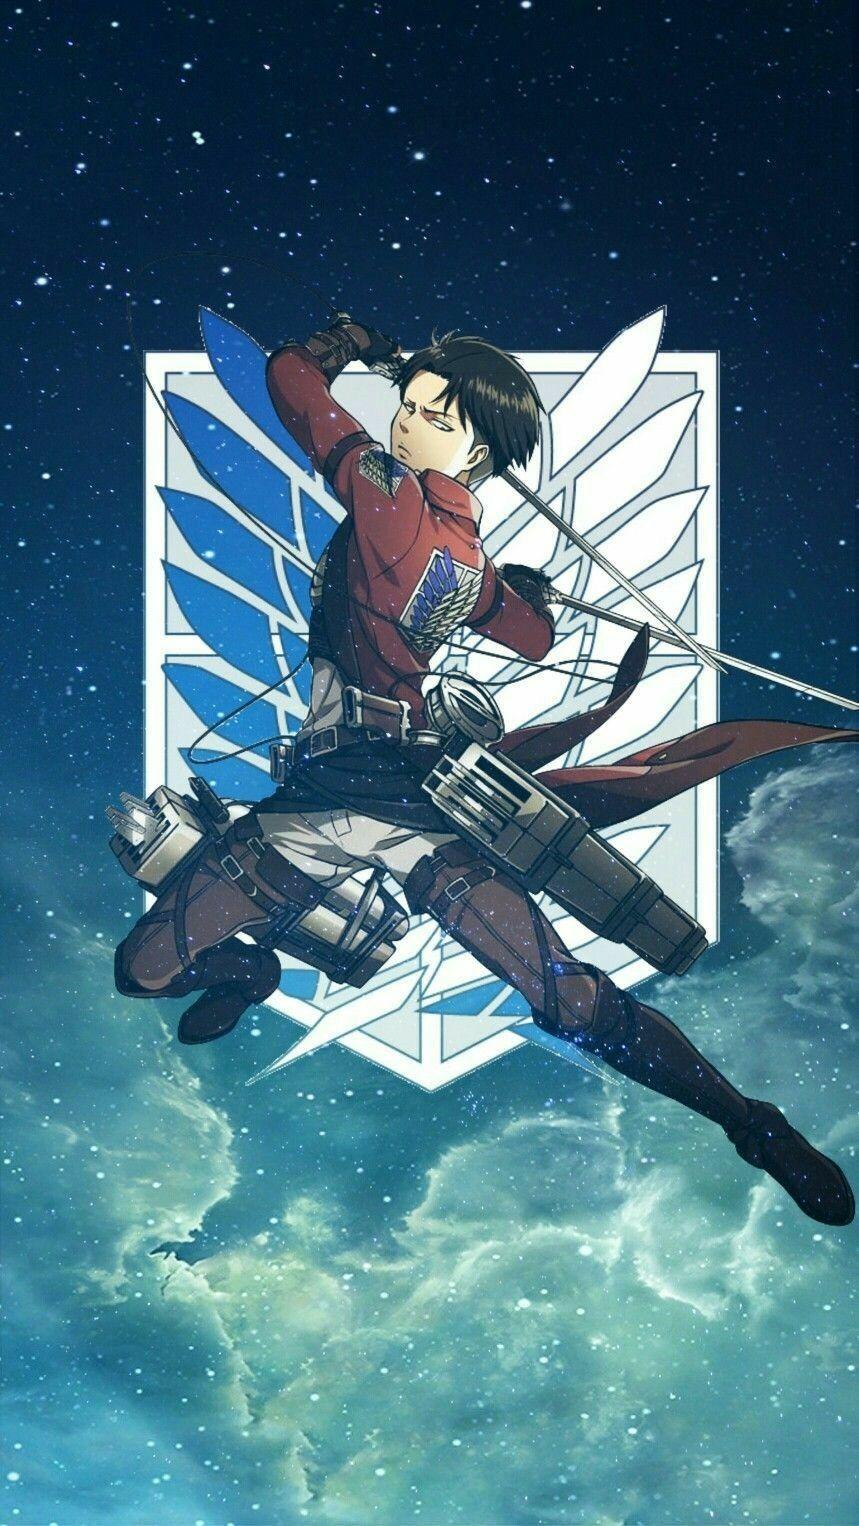 Attack On Titan Episode 1 画像あり かっこいい 壁紙 アニメ